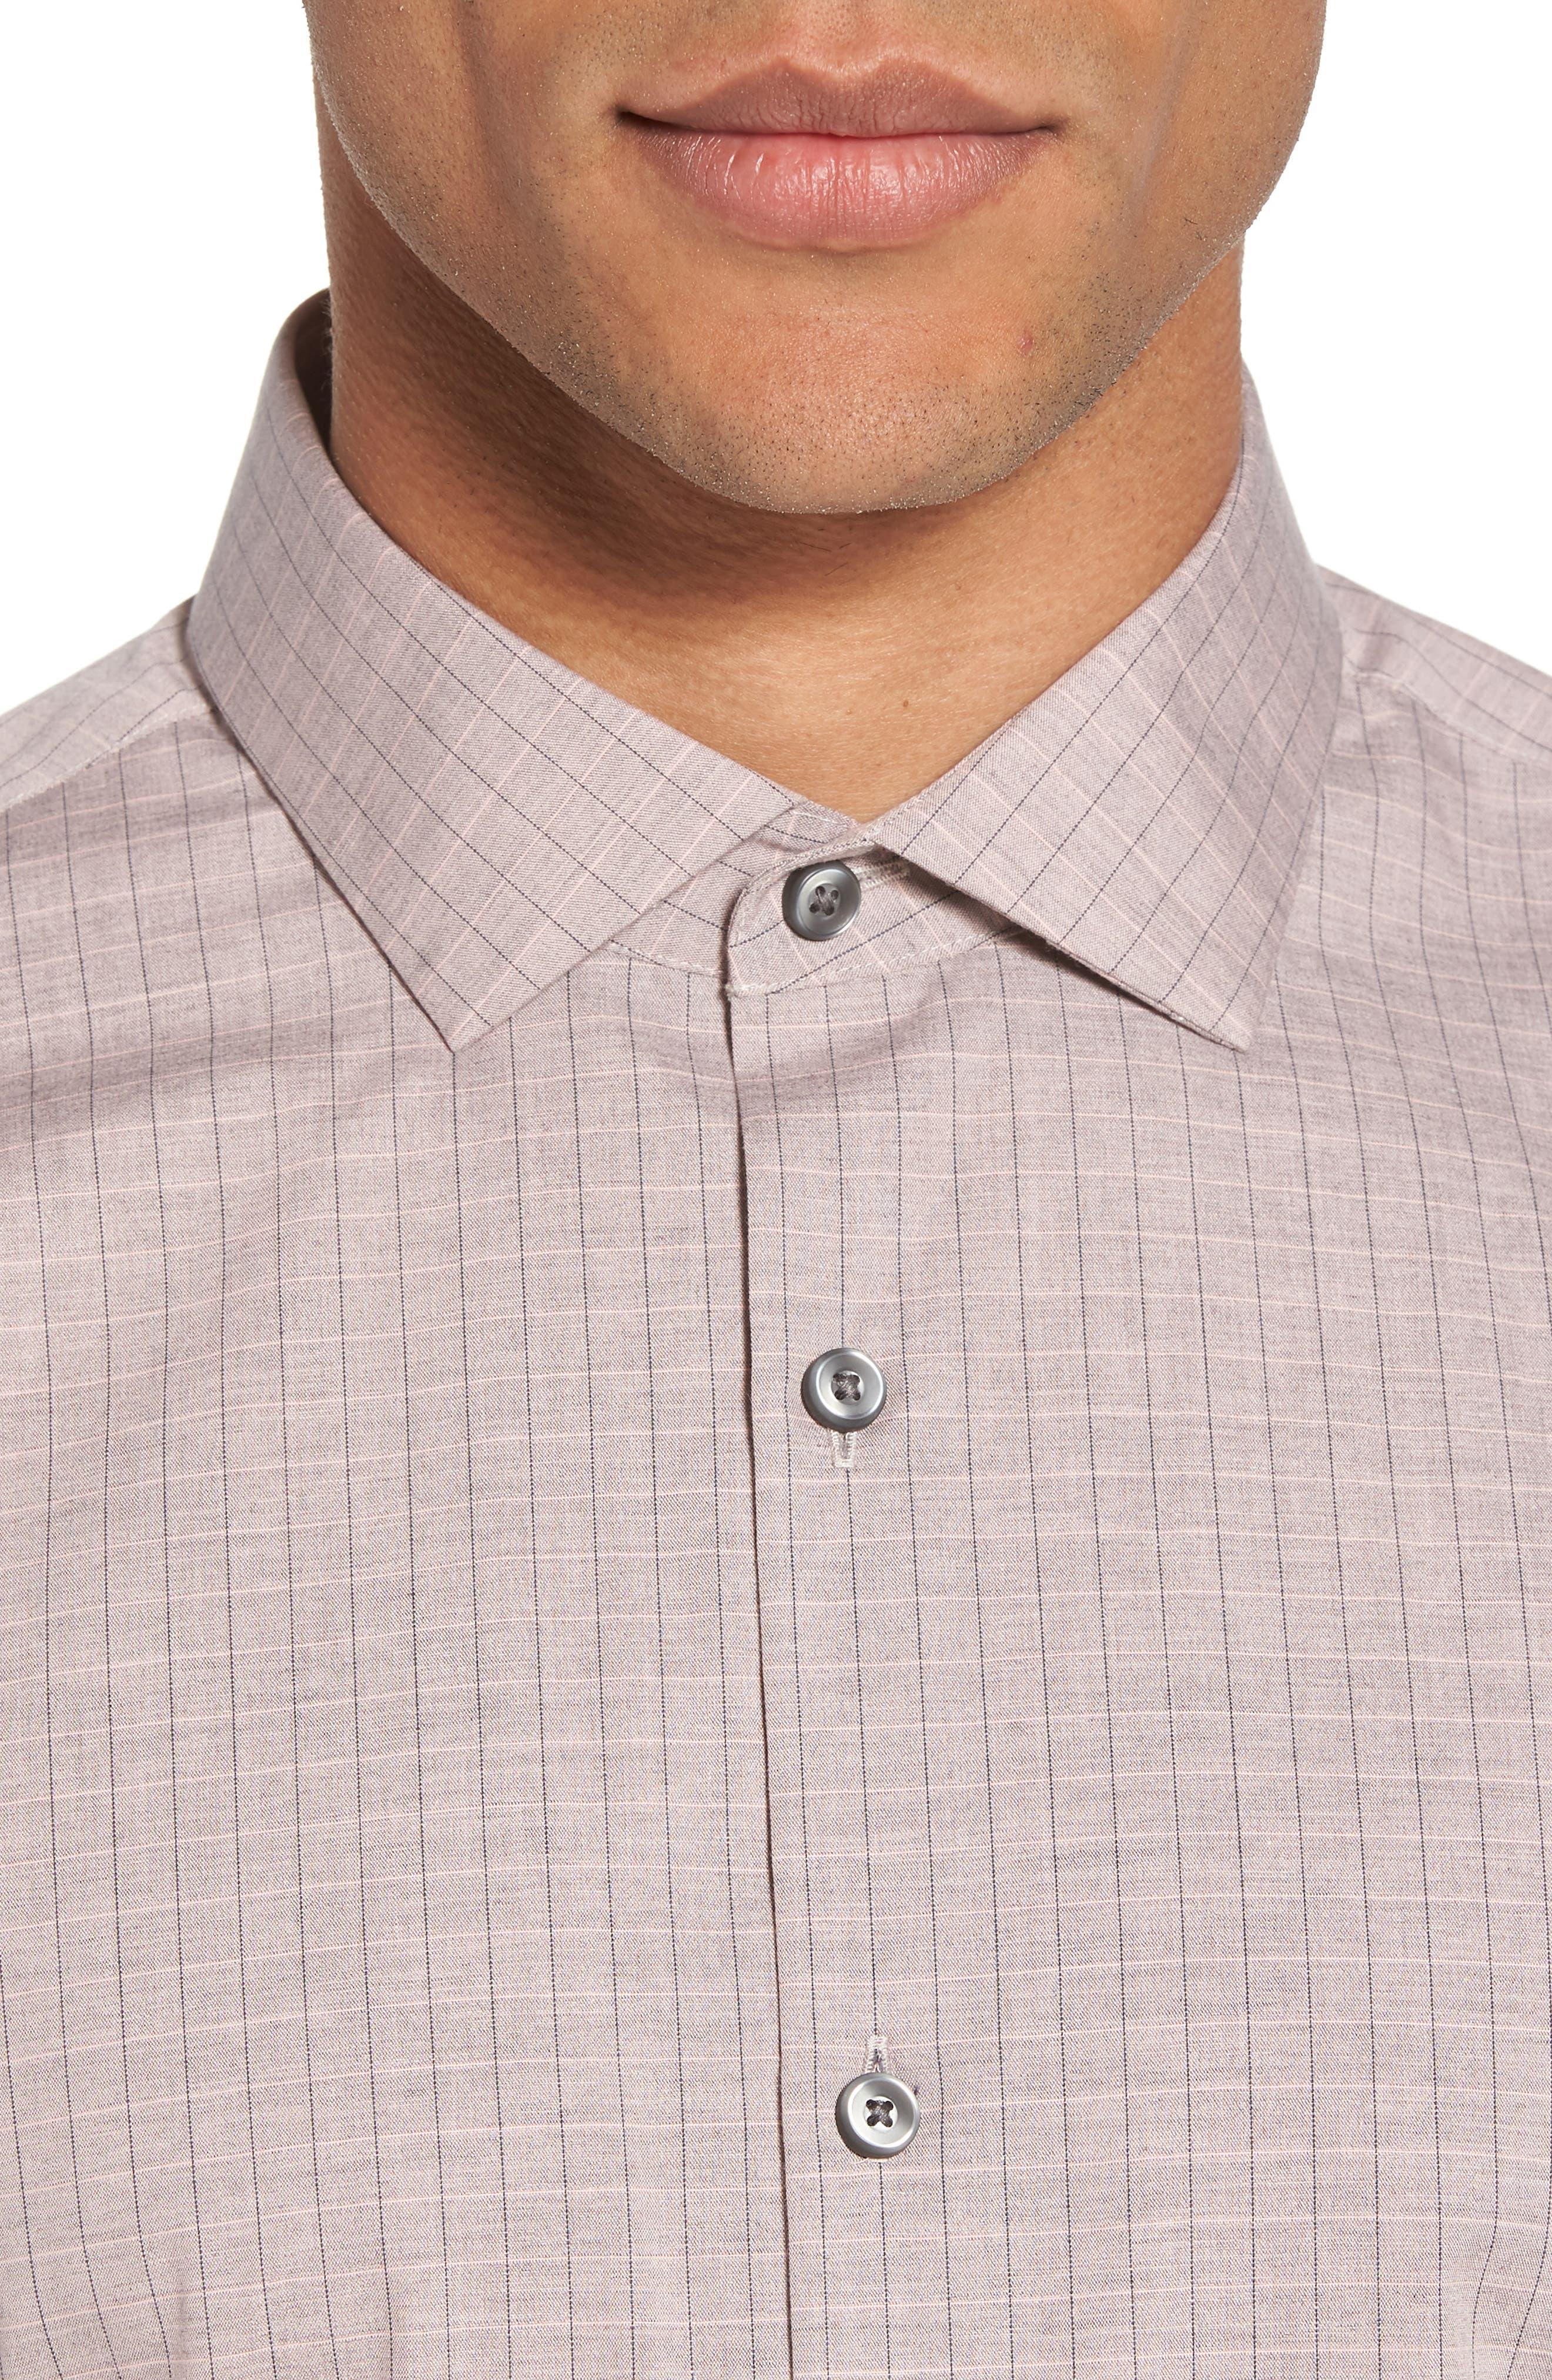 Grid Sport Shirt,                             Alternate thumbnail 2, color,                             Pink Silver Heather Grid